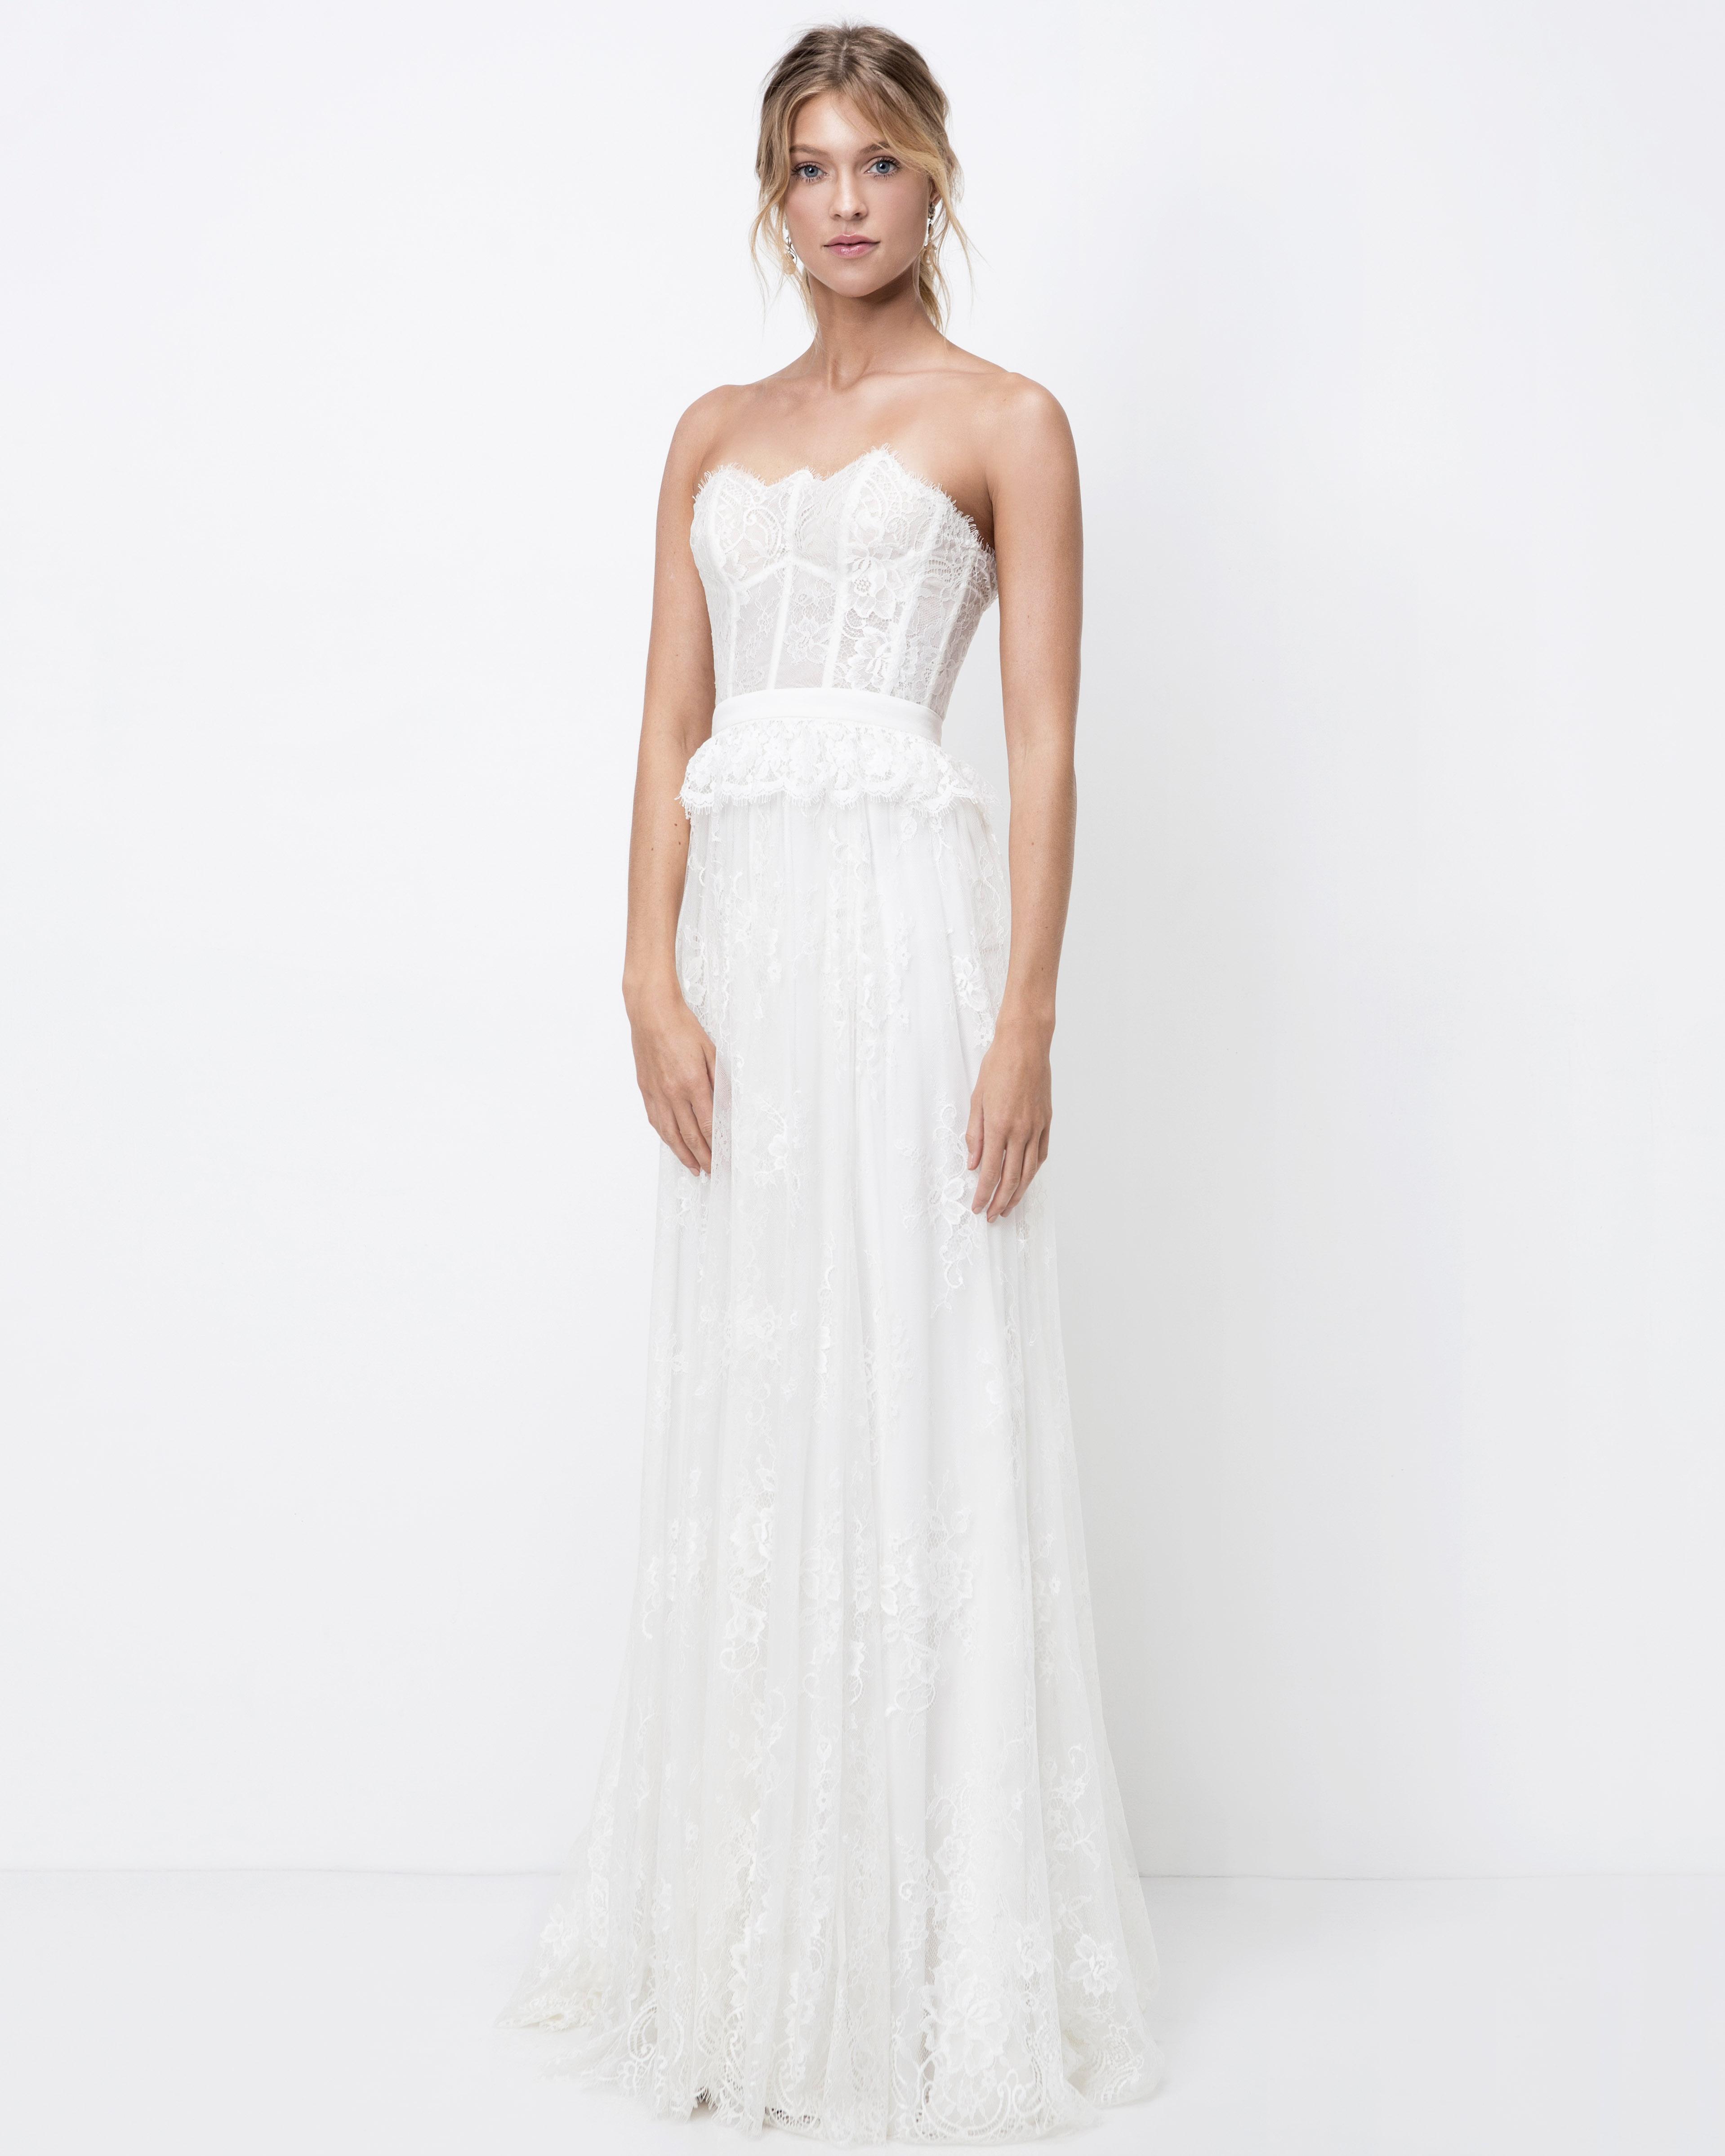 lihi hod strapless lace wedding dress fall 2018